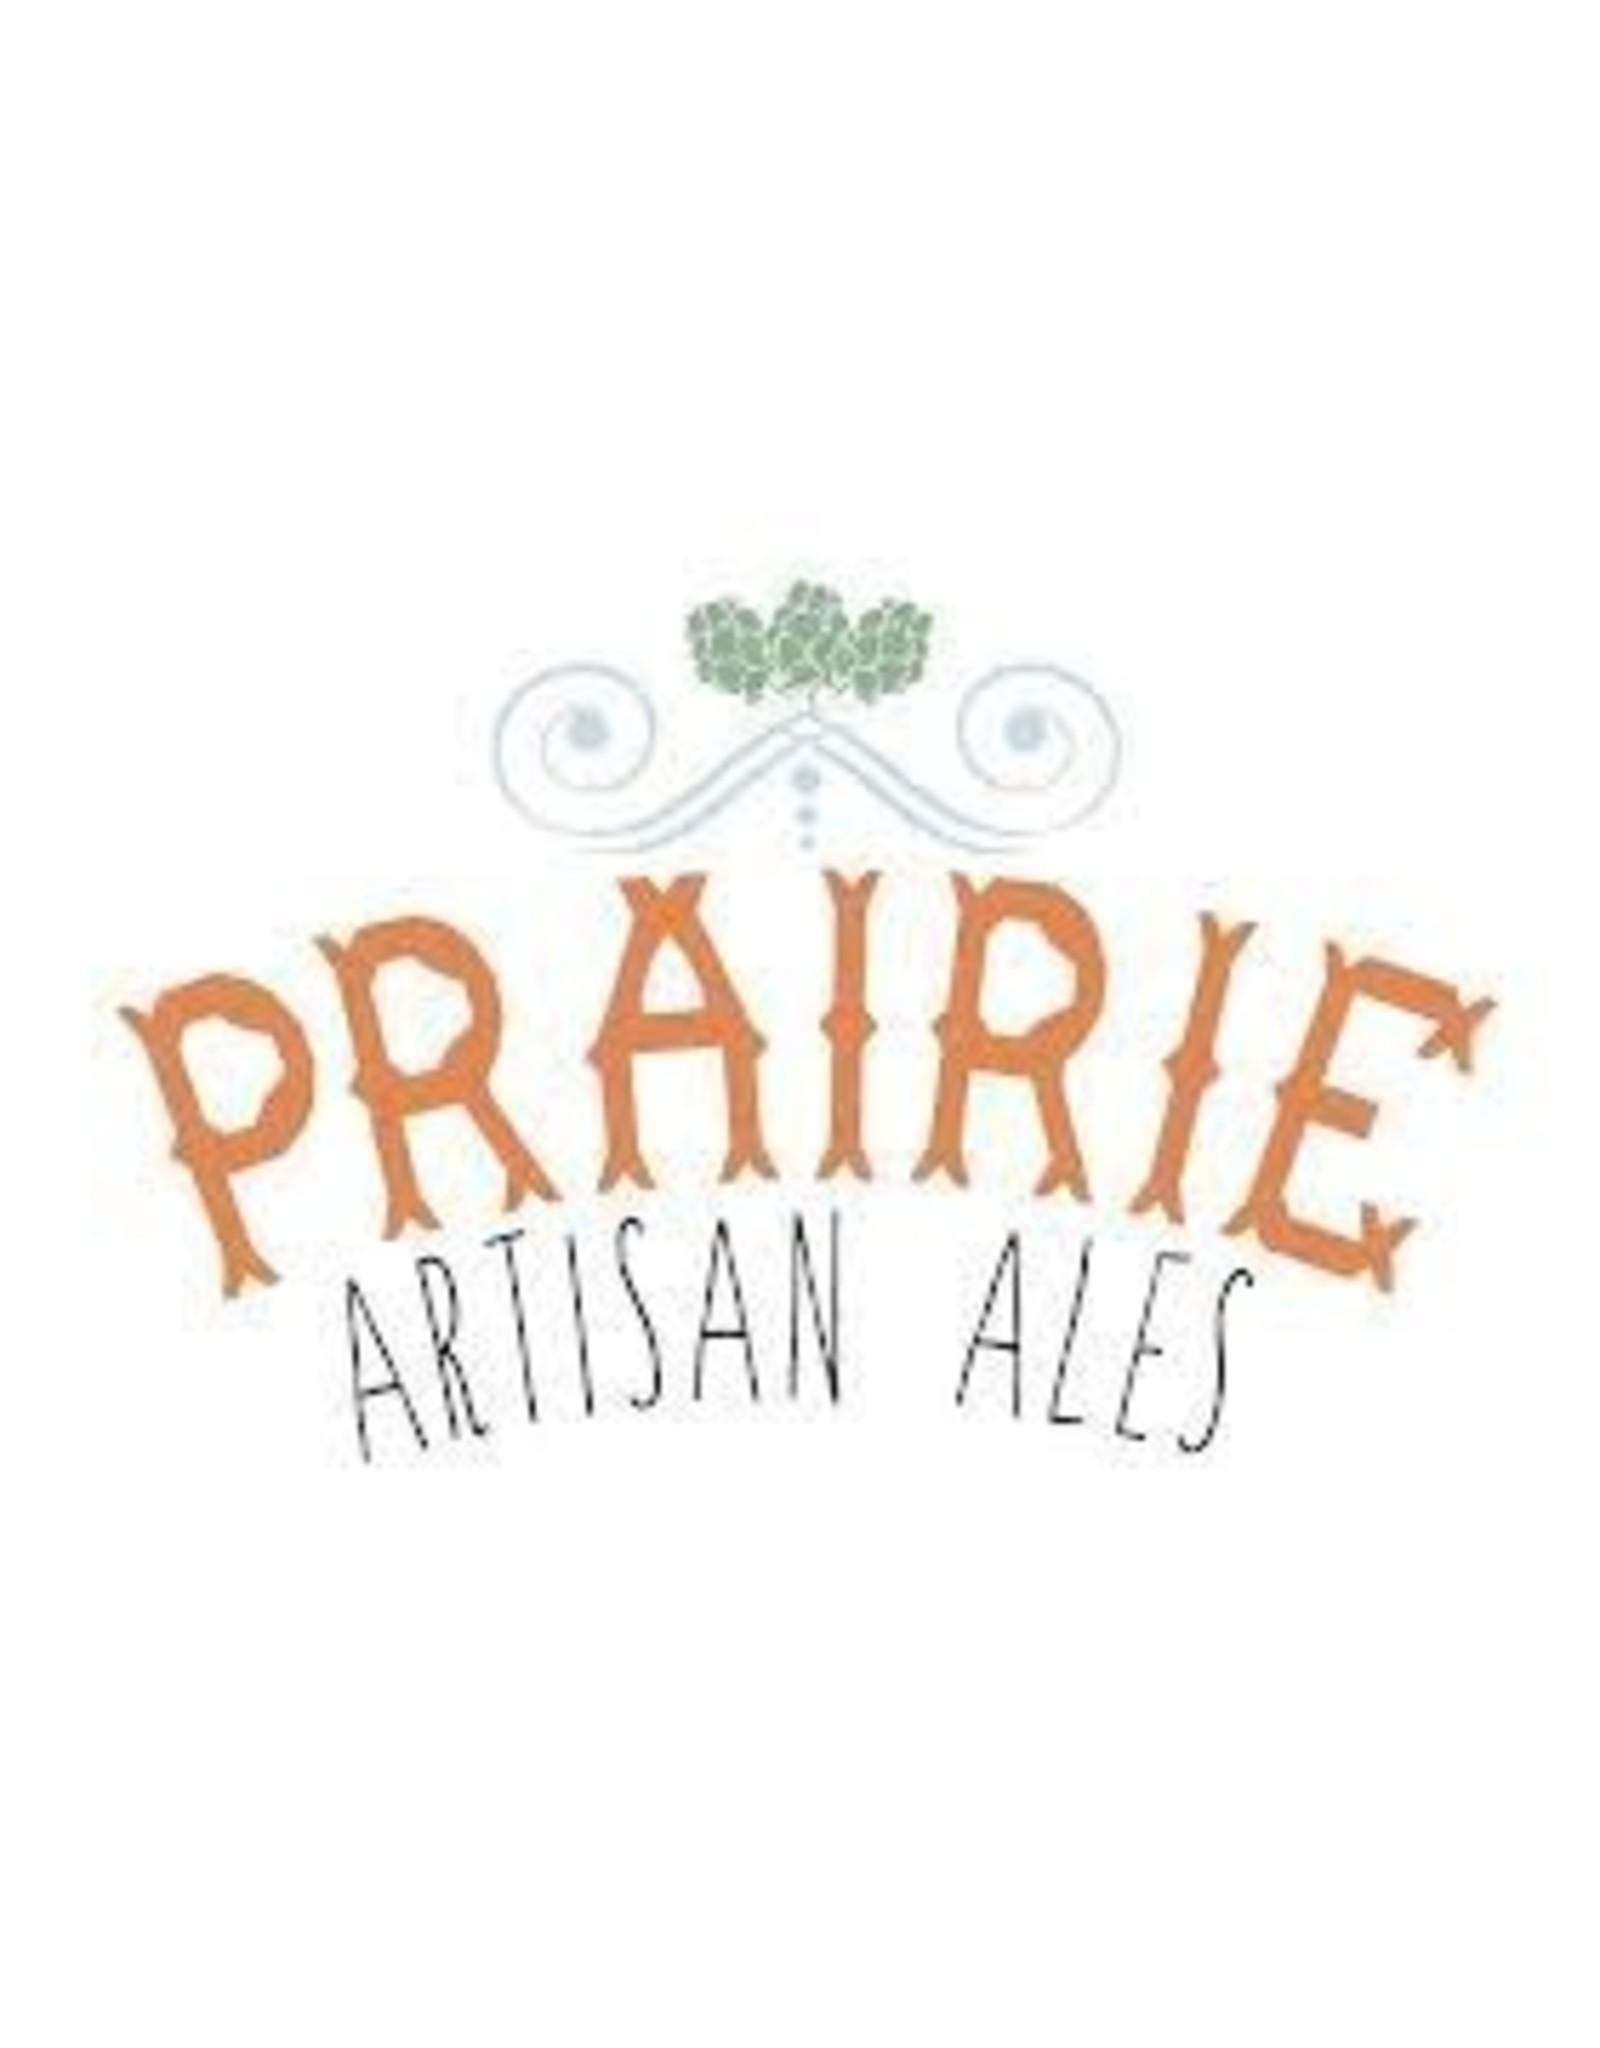 Prairie Prairie Pineapple All Y'all CROWLER